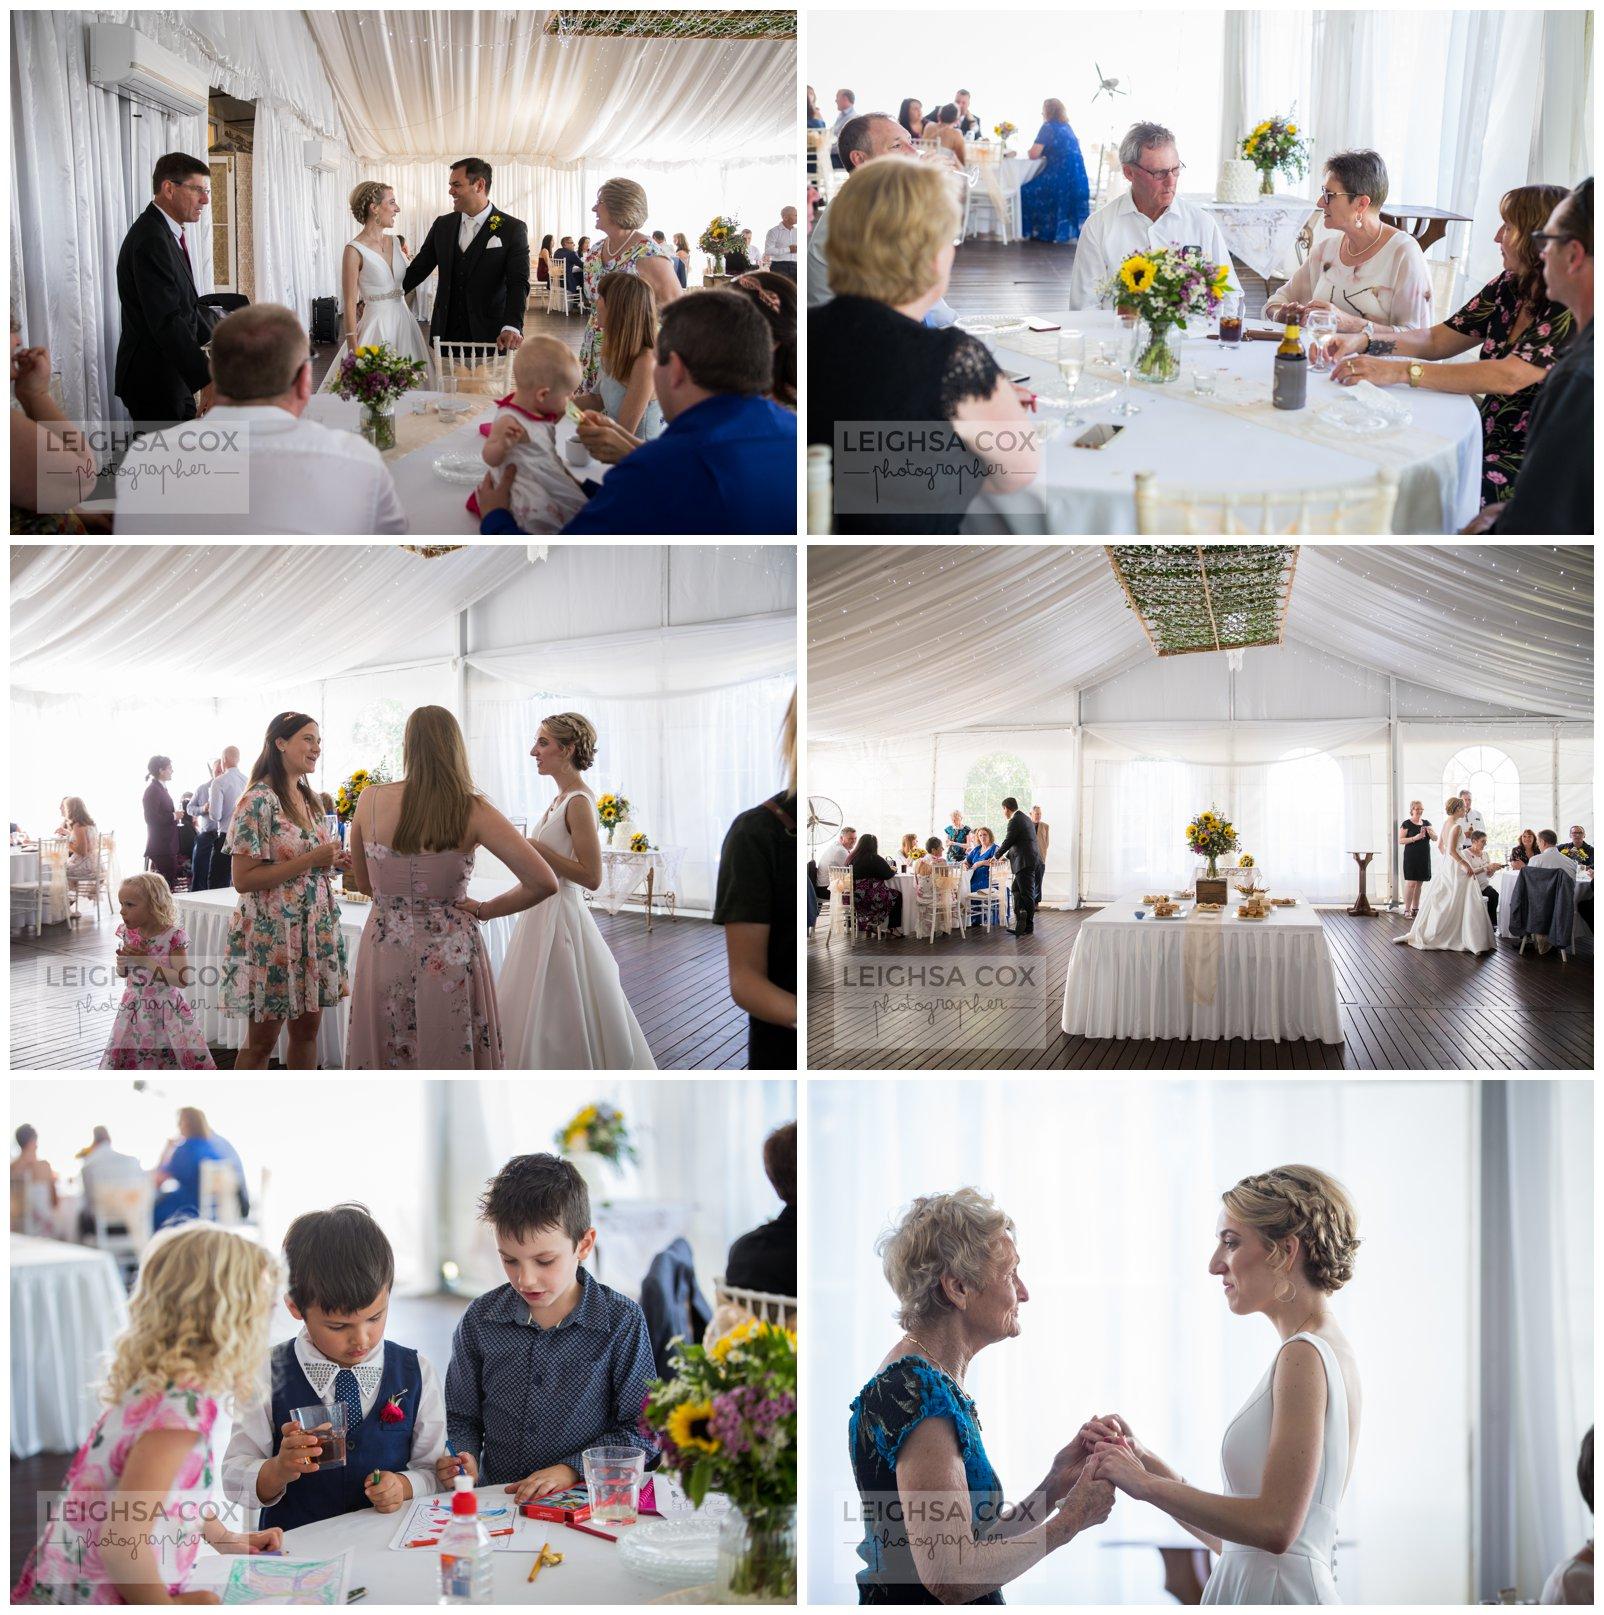 woodville wedding